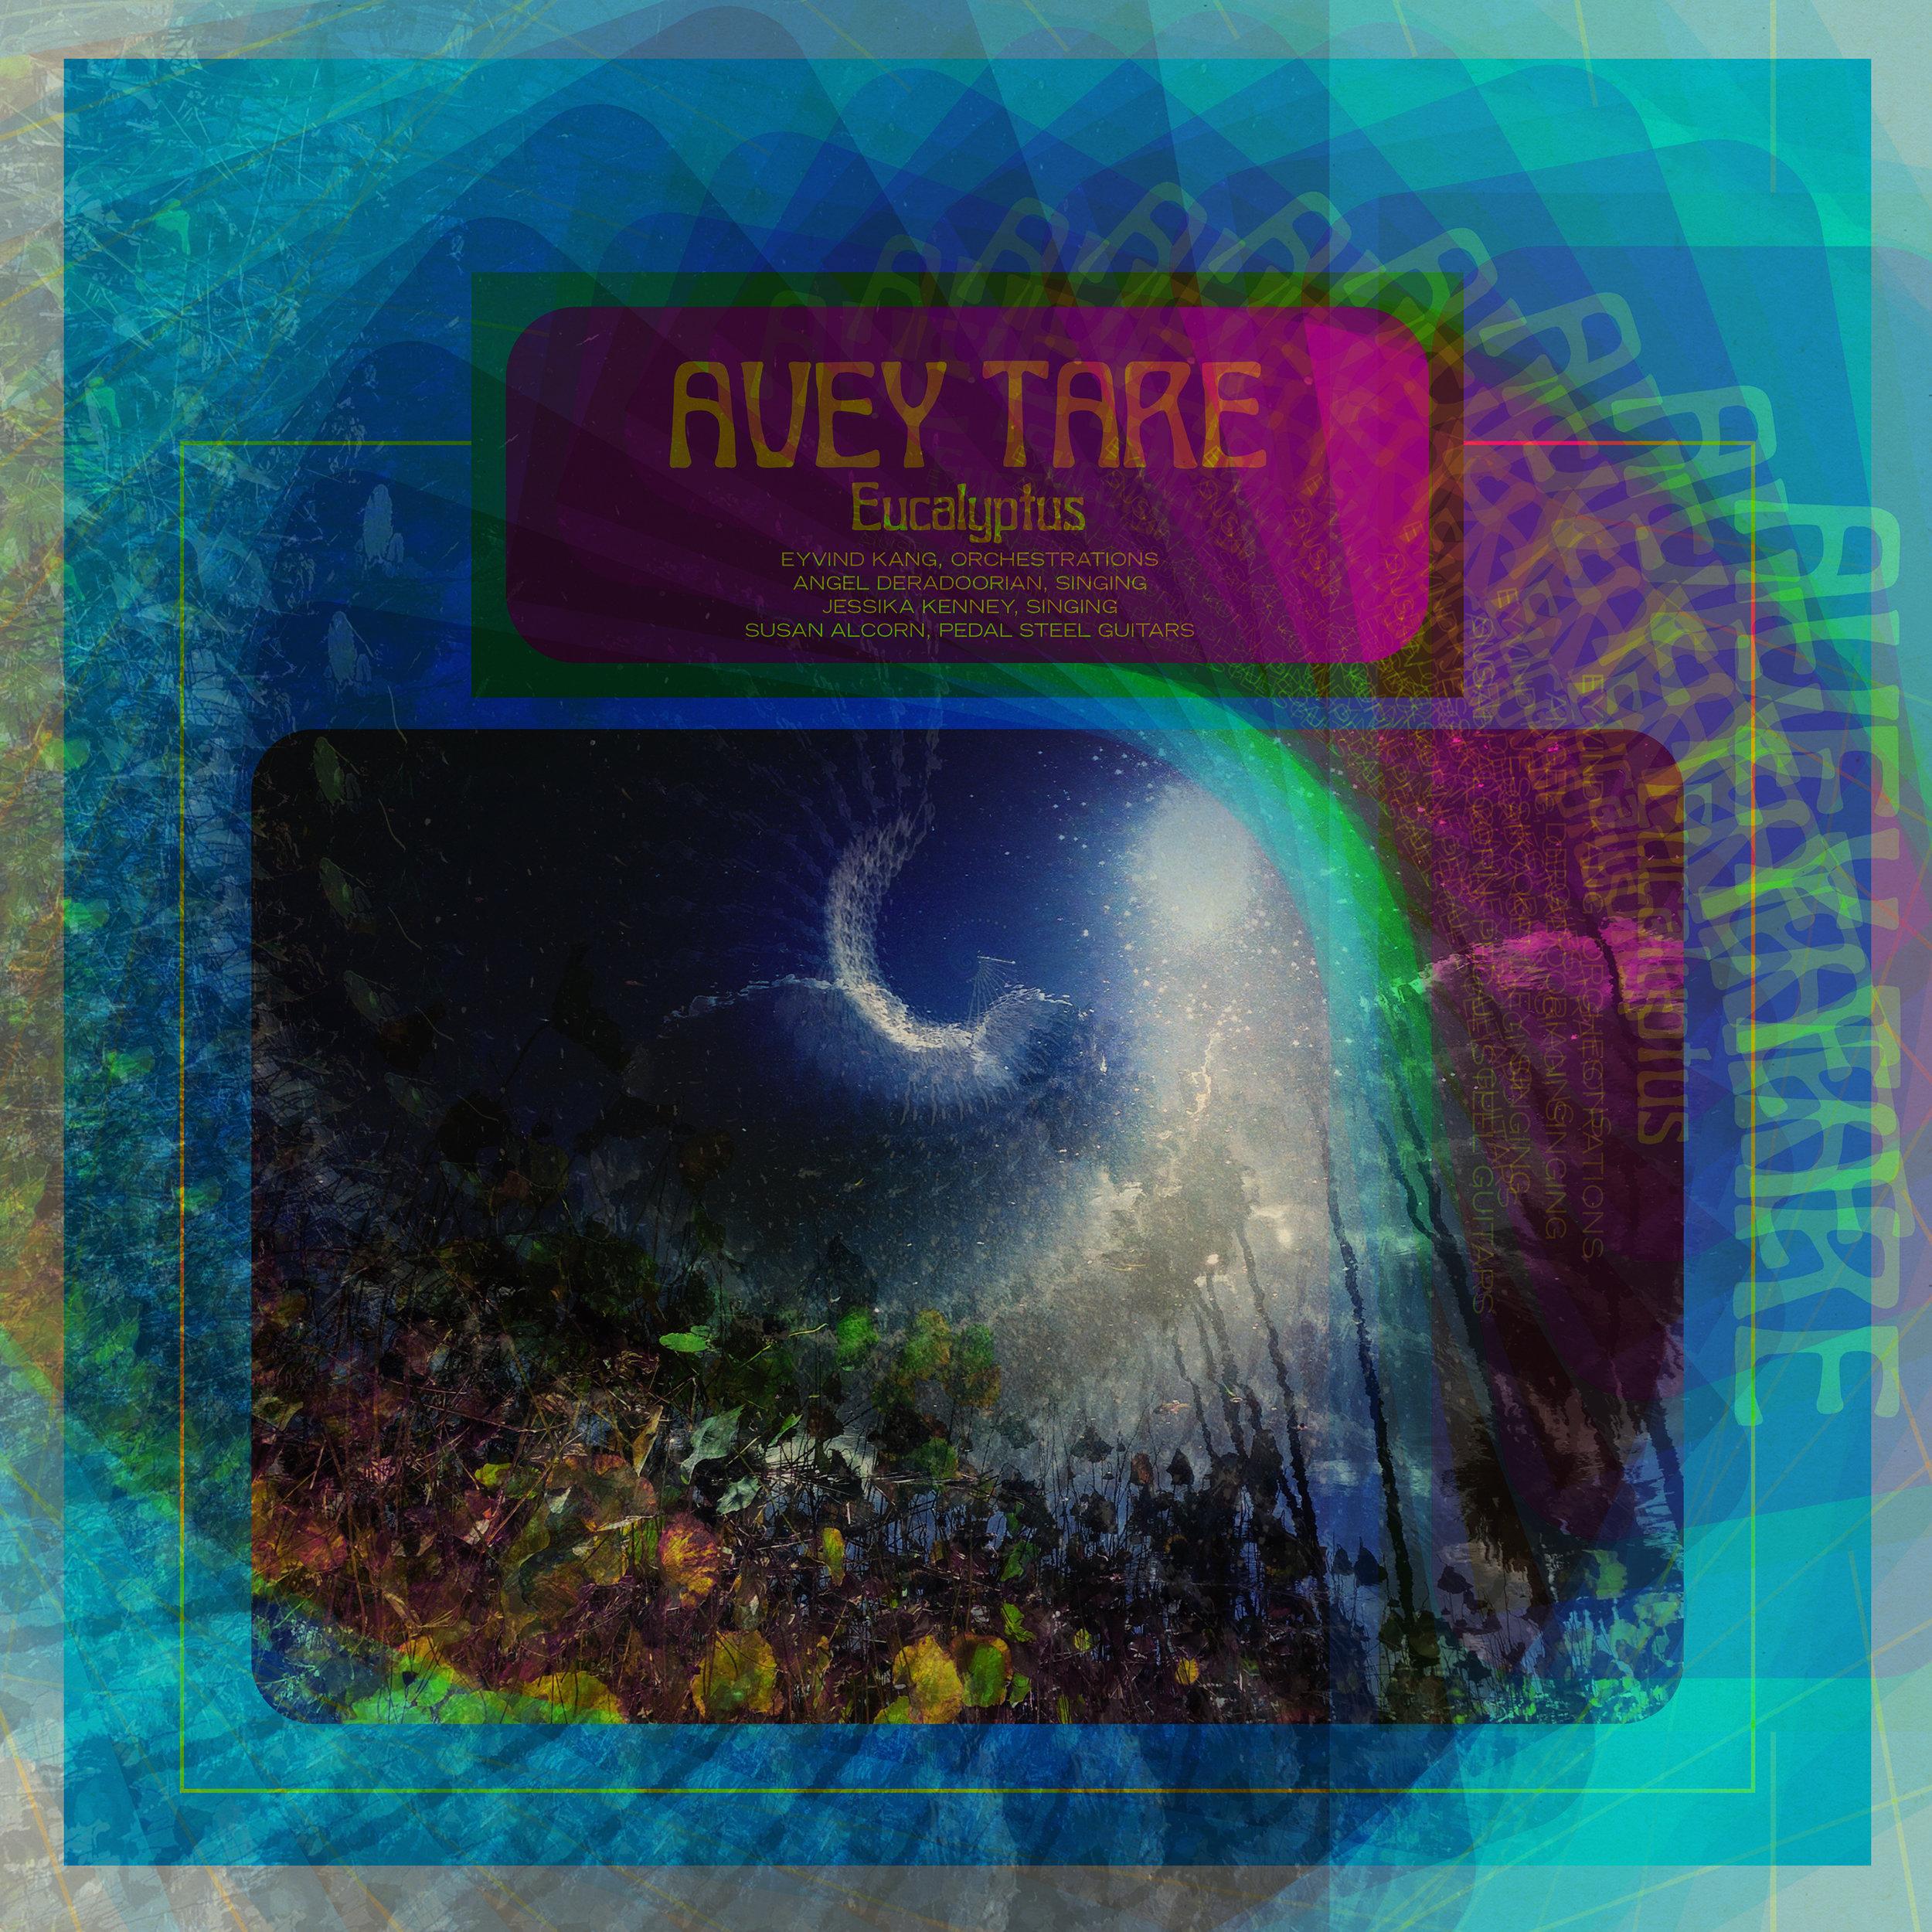 Avey Tare - Eucalyptus - Oboe, English horn, flute